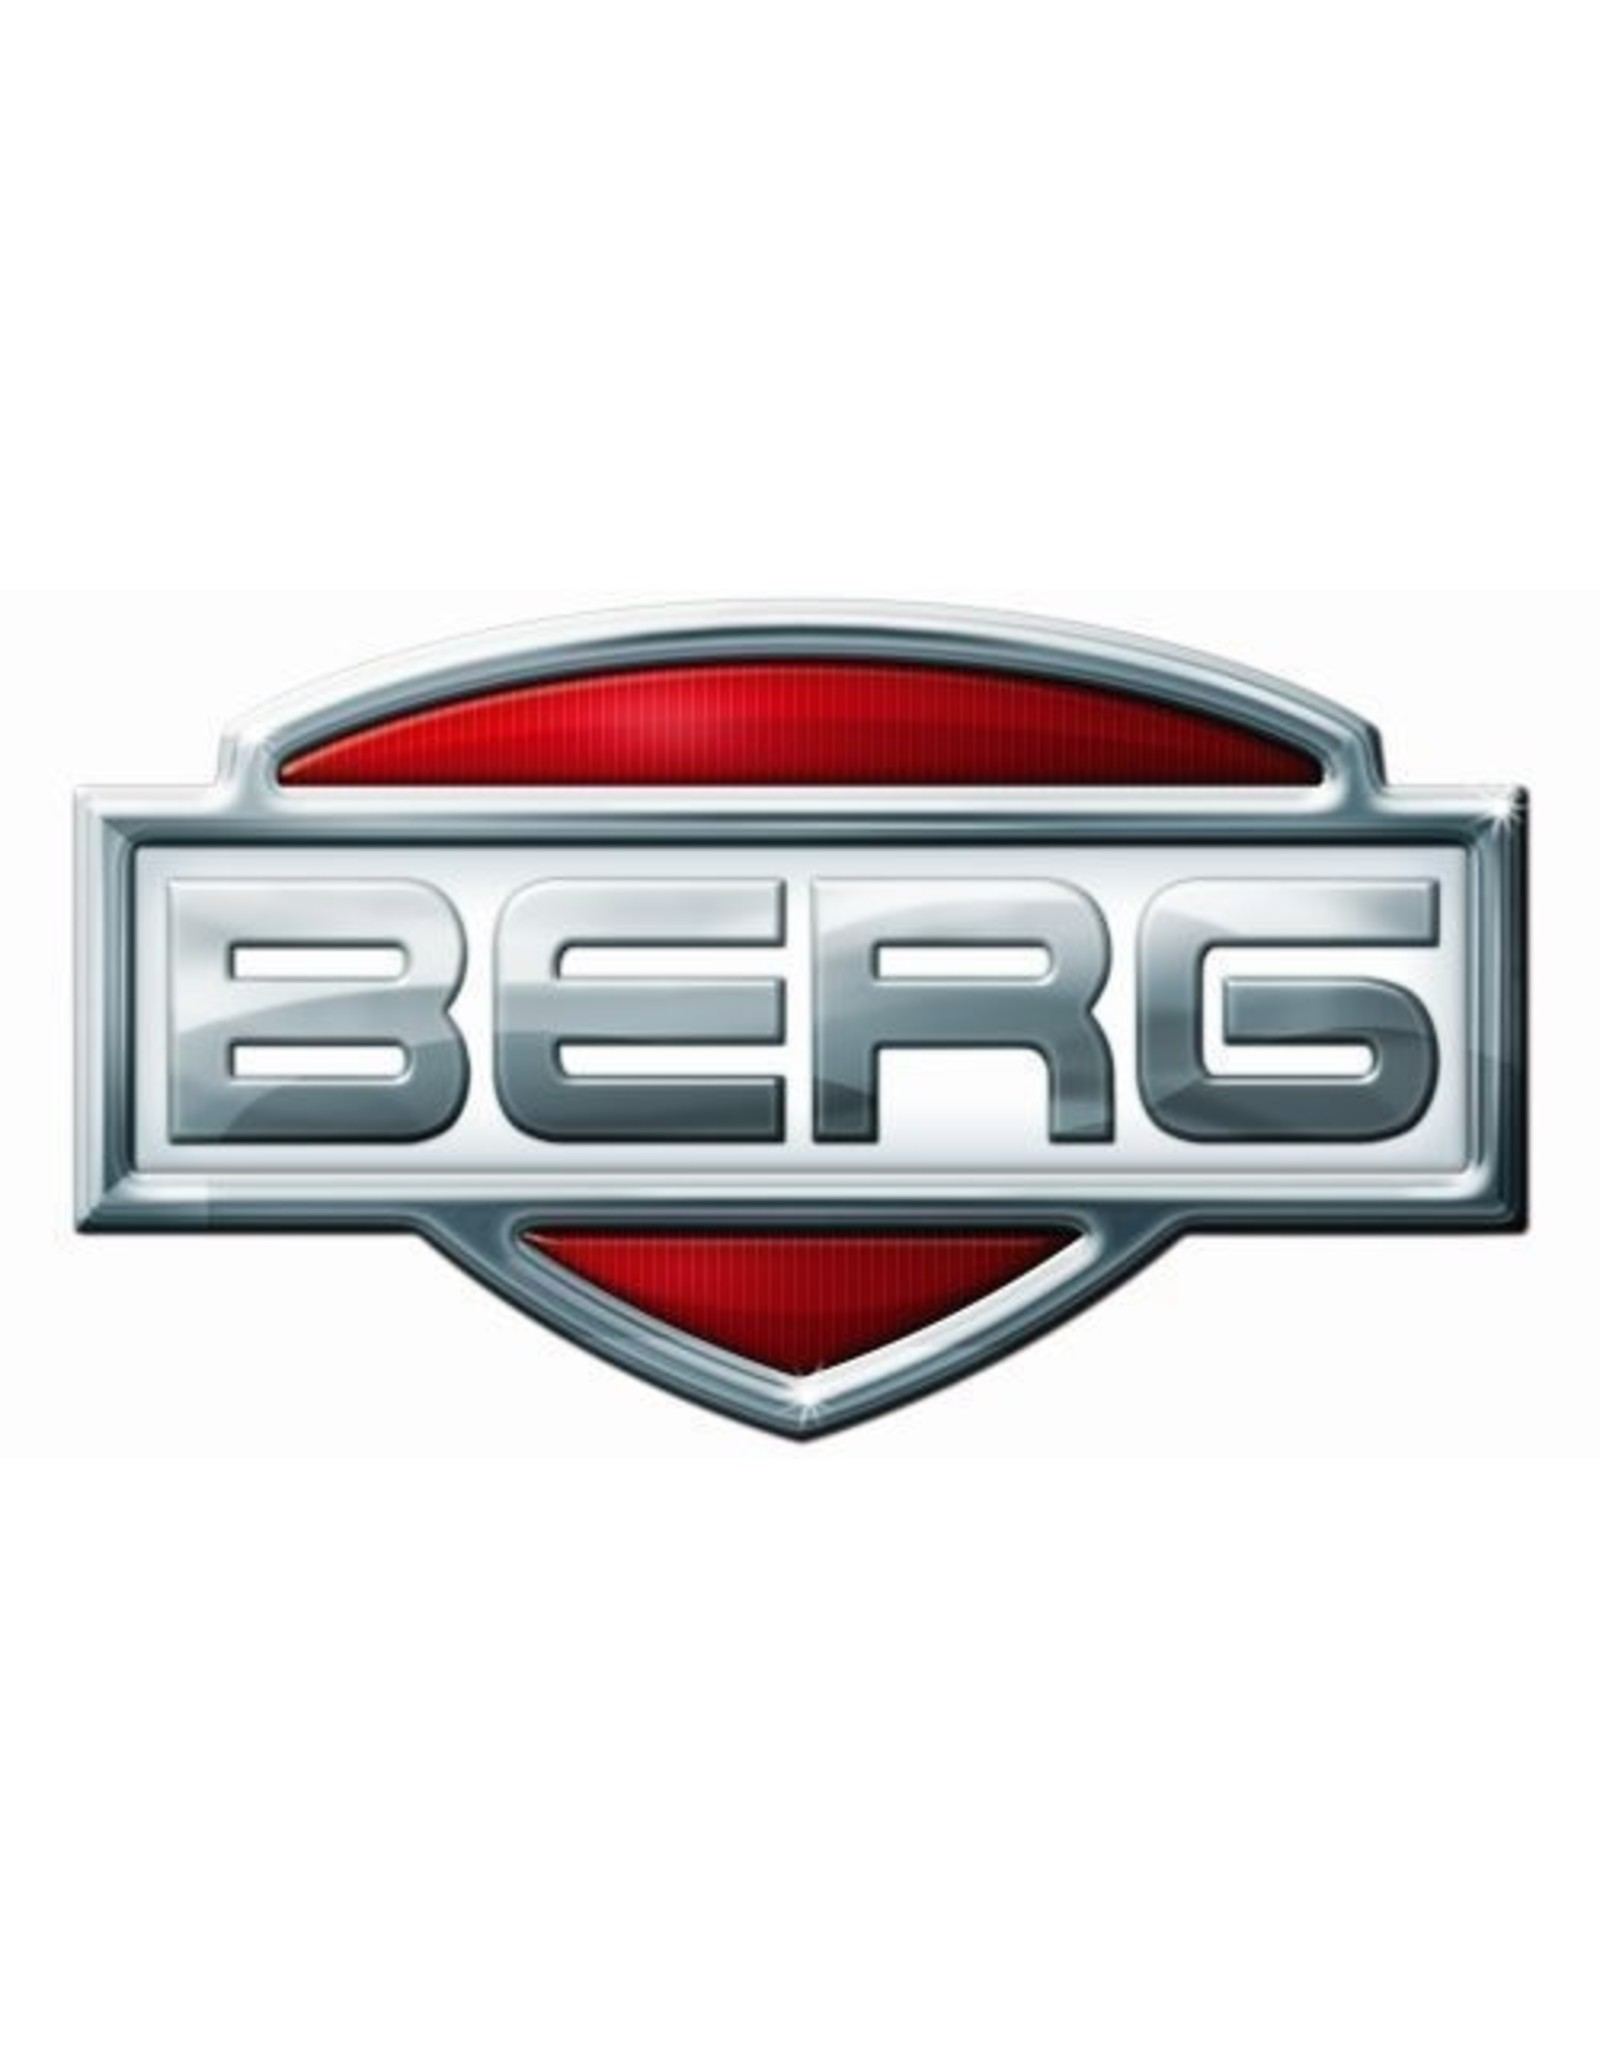 BERG BERG Champion - Sprungtuch 430 (TwinSpring)